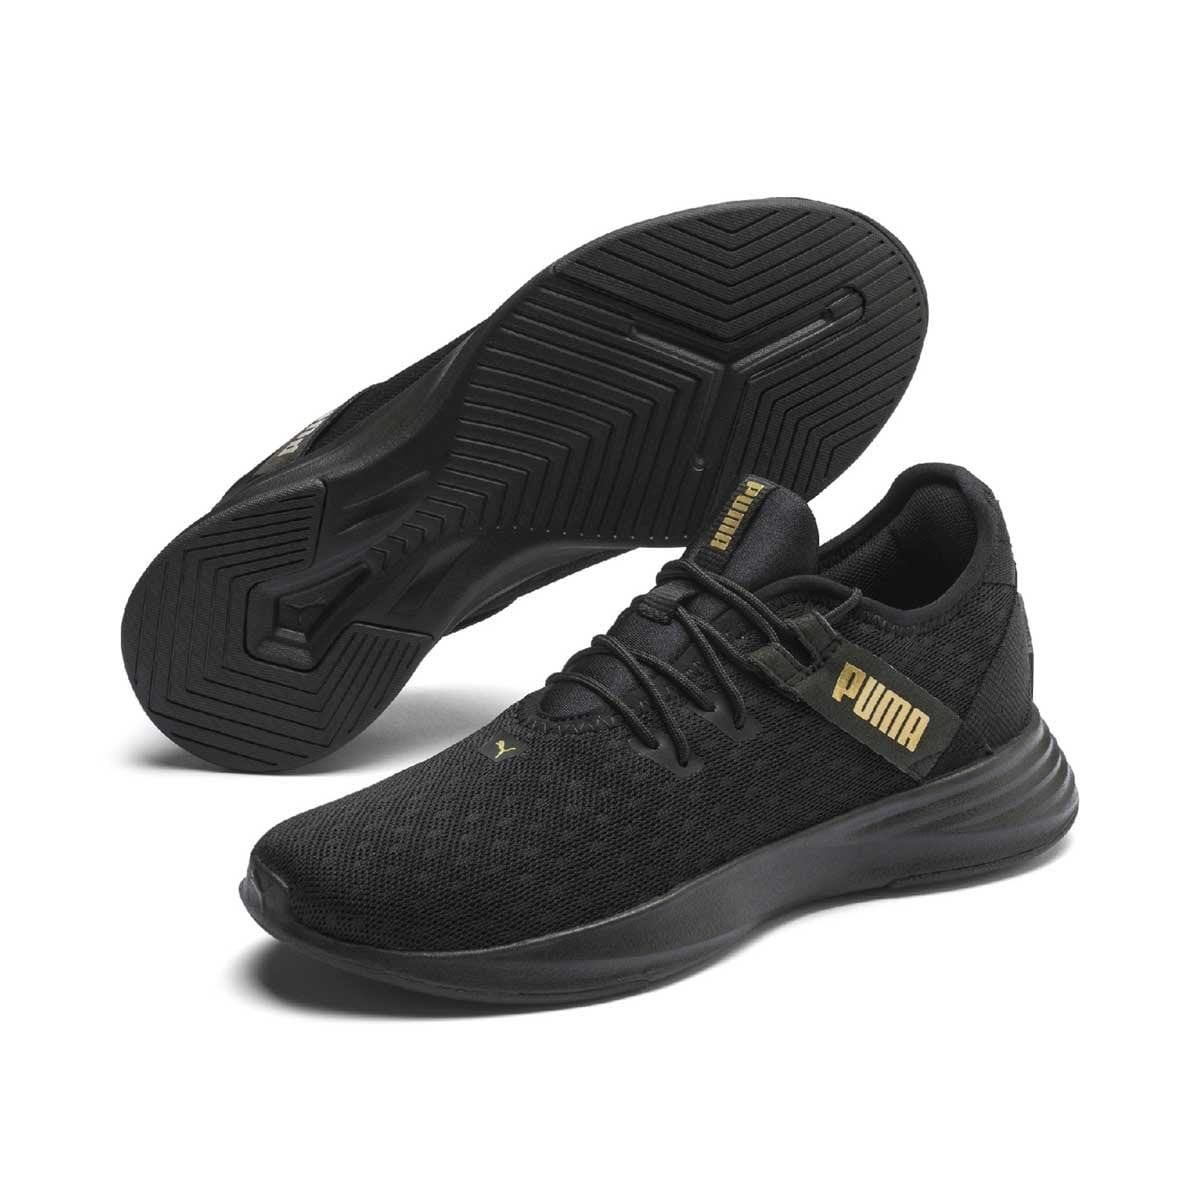 zapatos deportivos puma para mujer nueva temporada netflix 4k